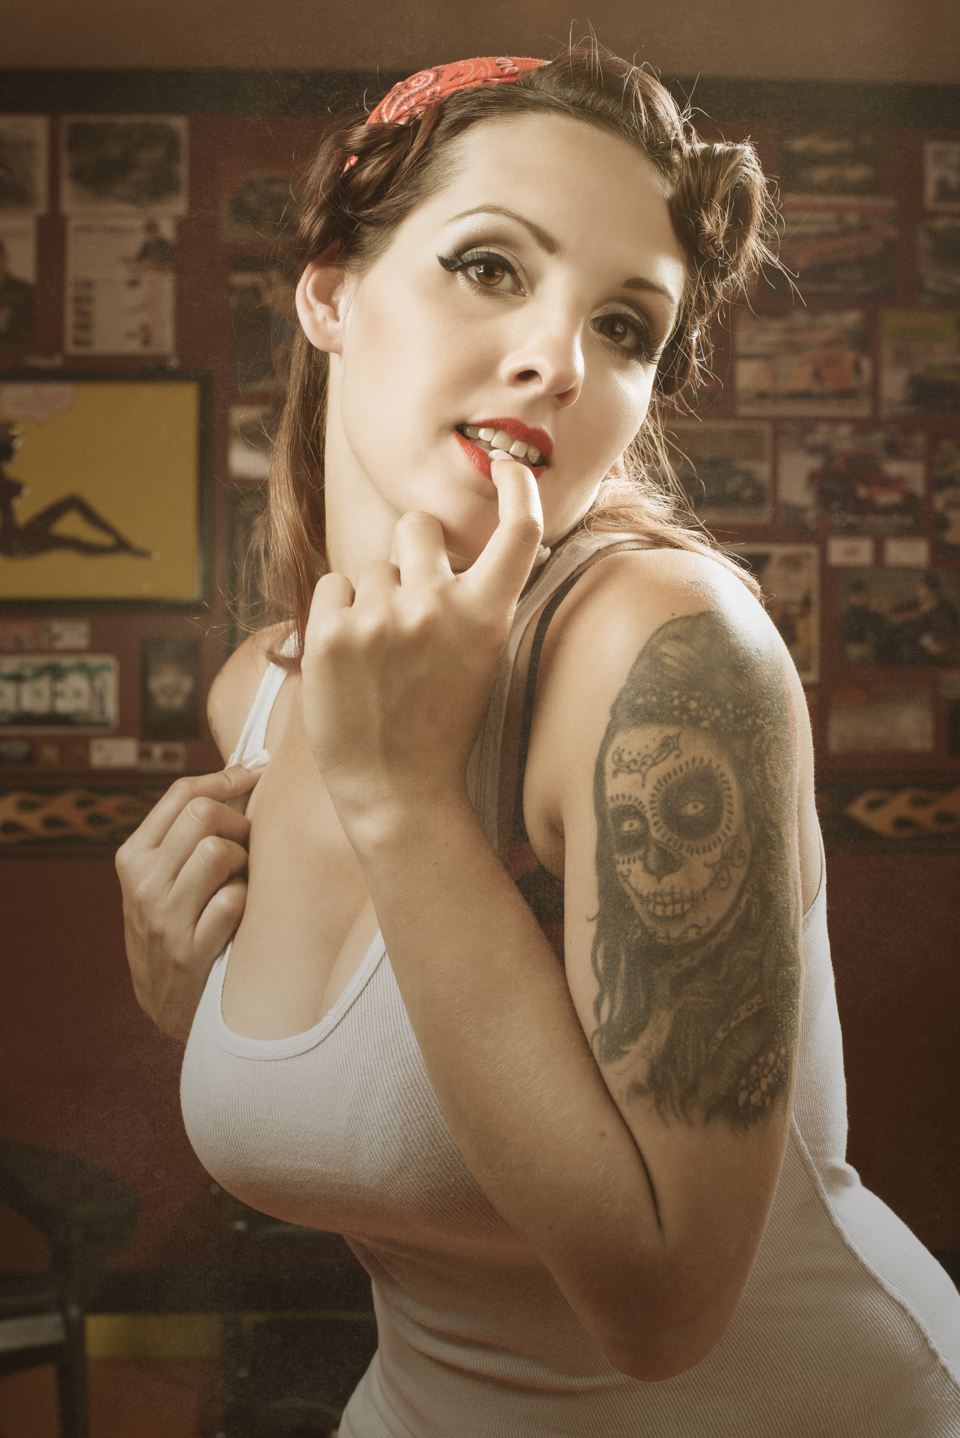 Nigel Fearon Photography | Katrina Bernardi Pinup-3.jpg